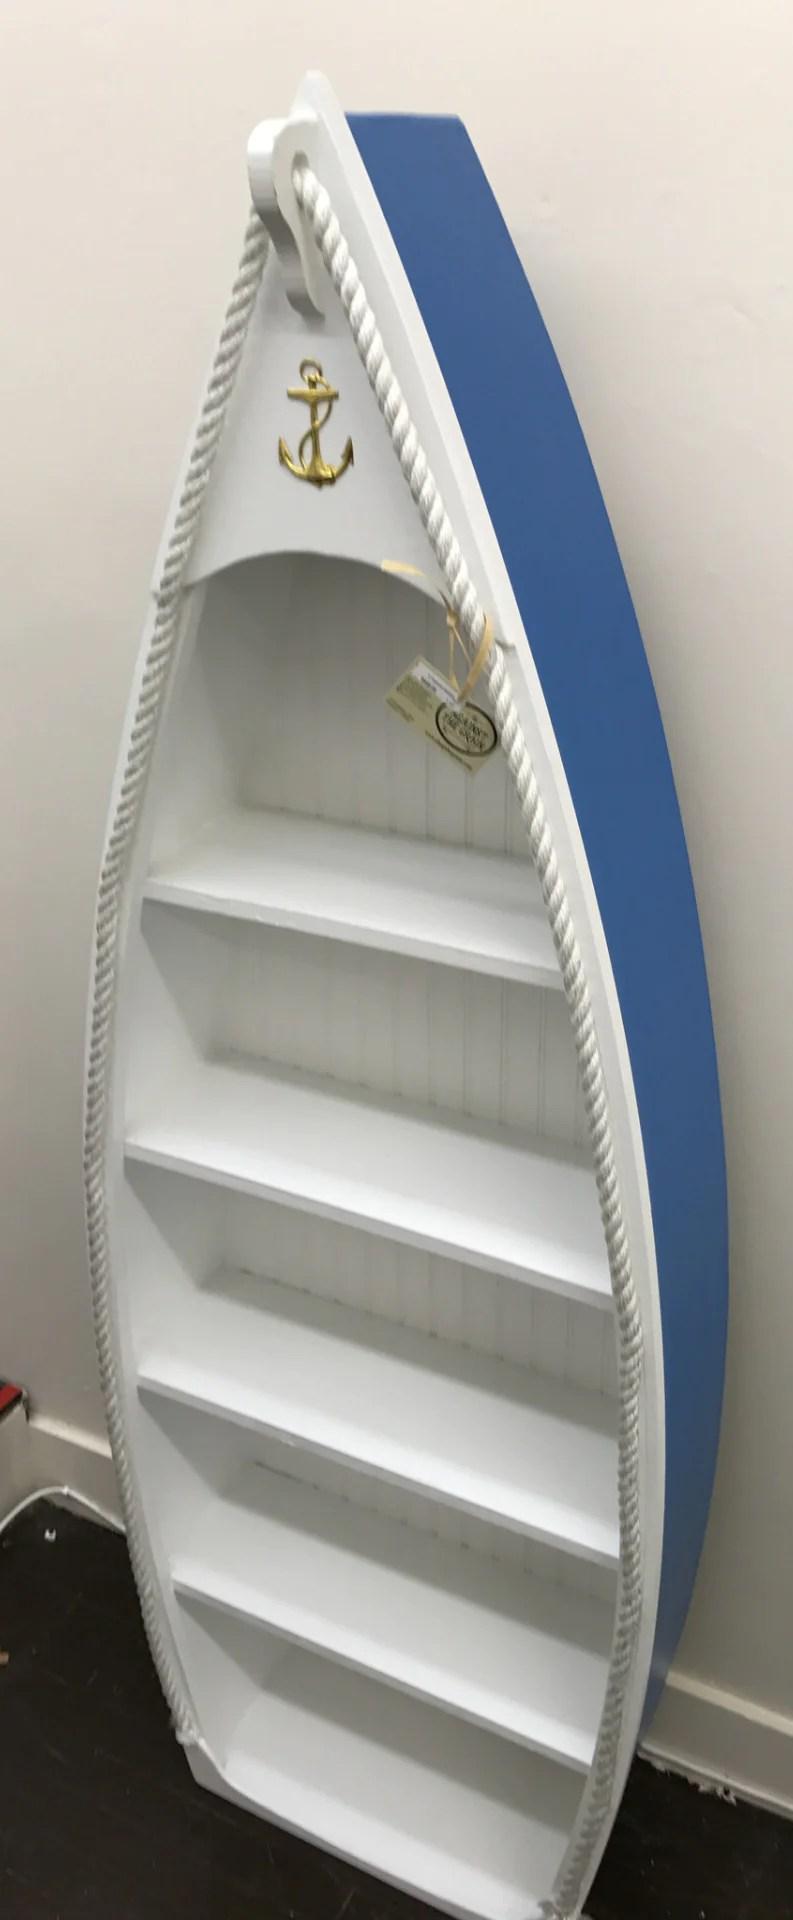 Rowboat Book Shelf Against The Grain